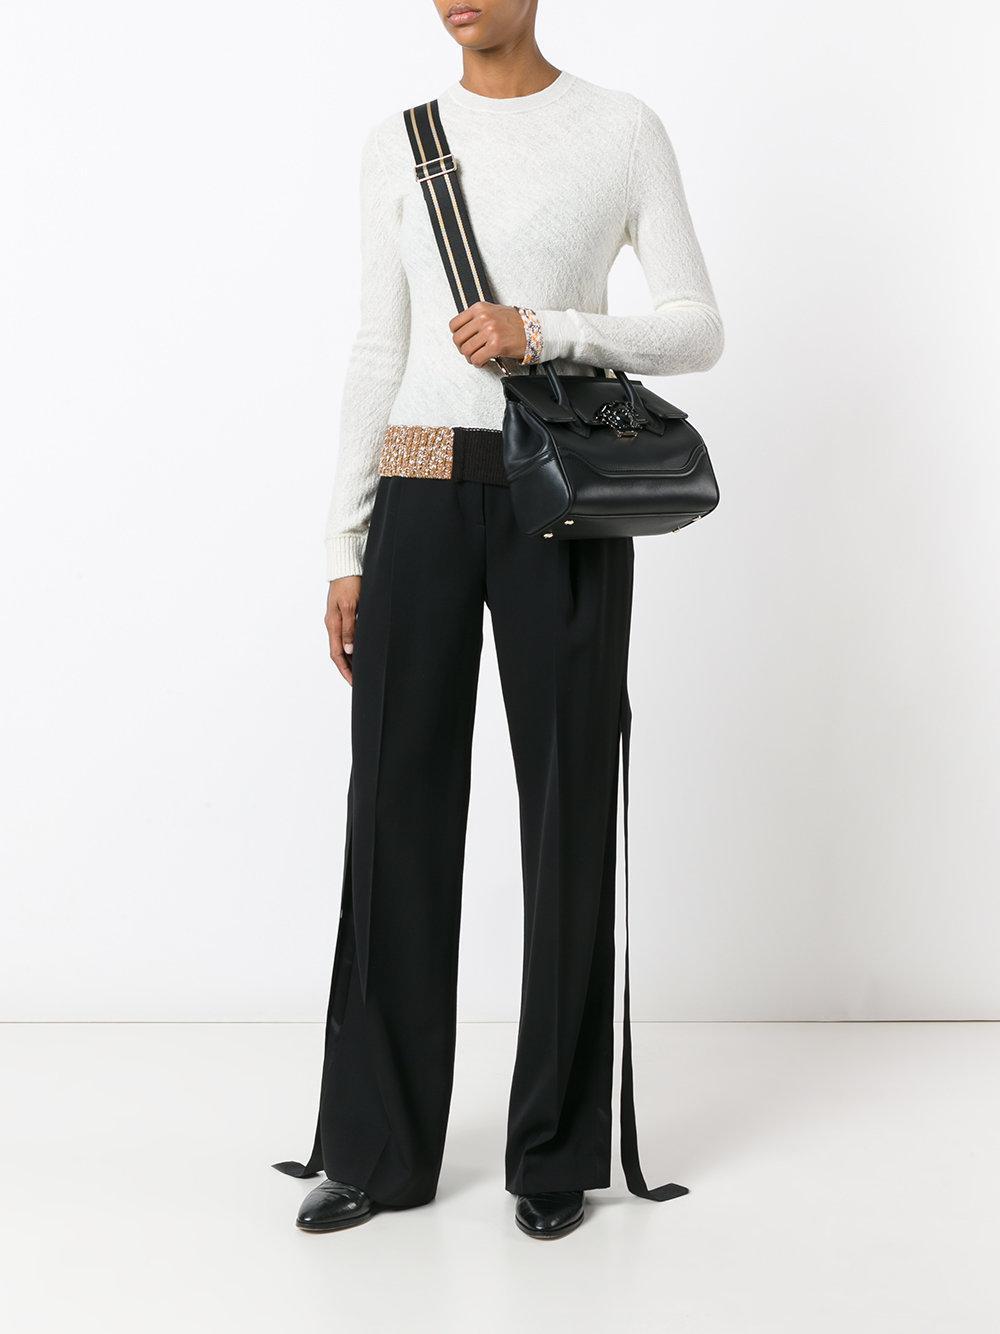 398db936cd Lyst - Versace Palazzo Empire Shoulder Bag in Black - Save 7%